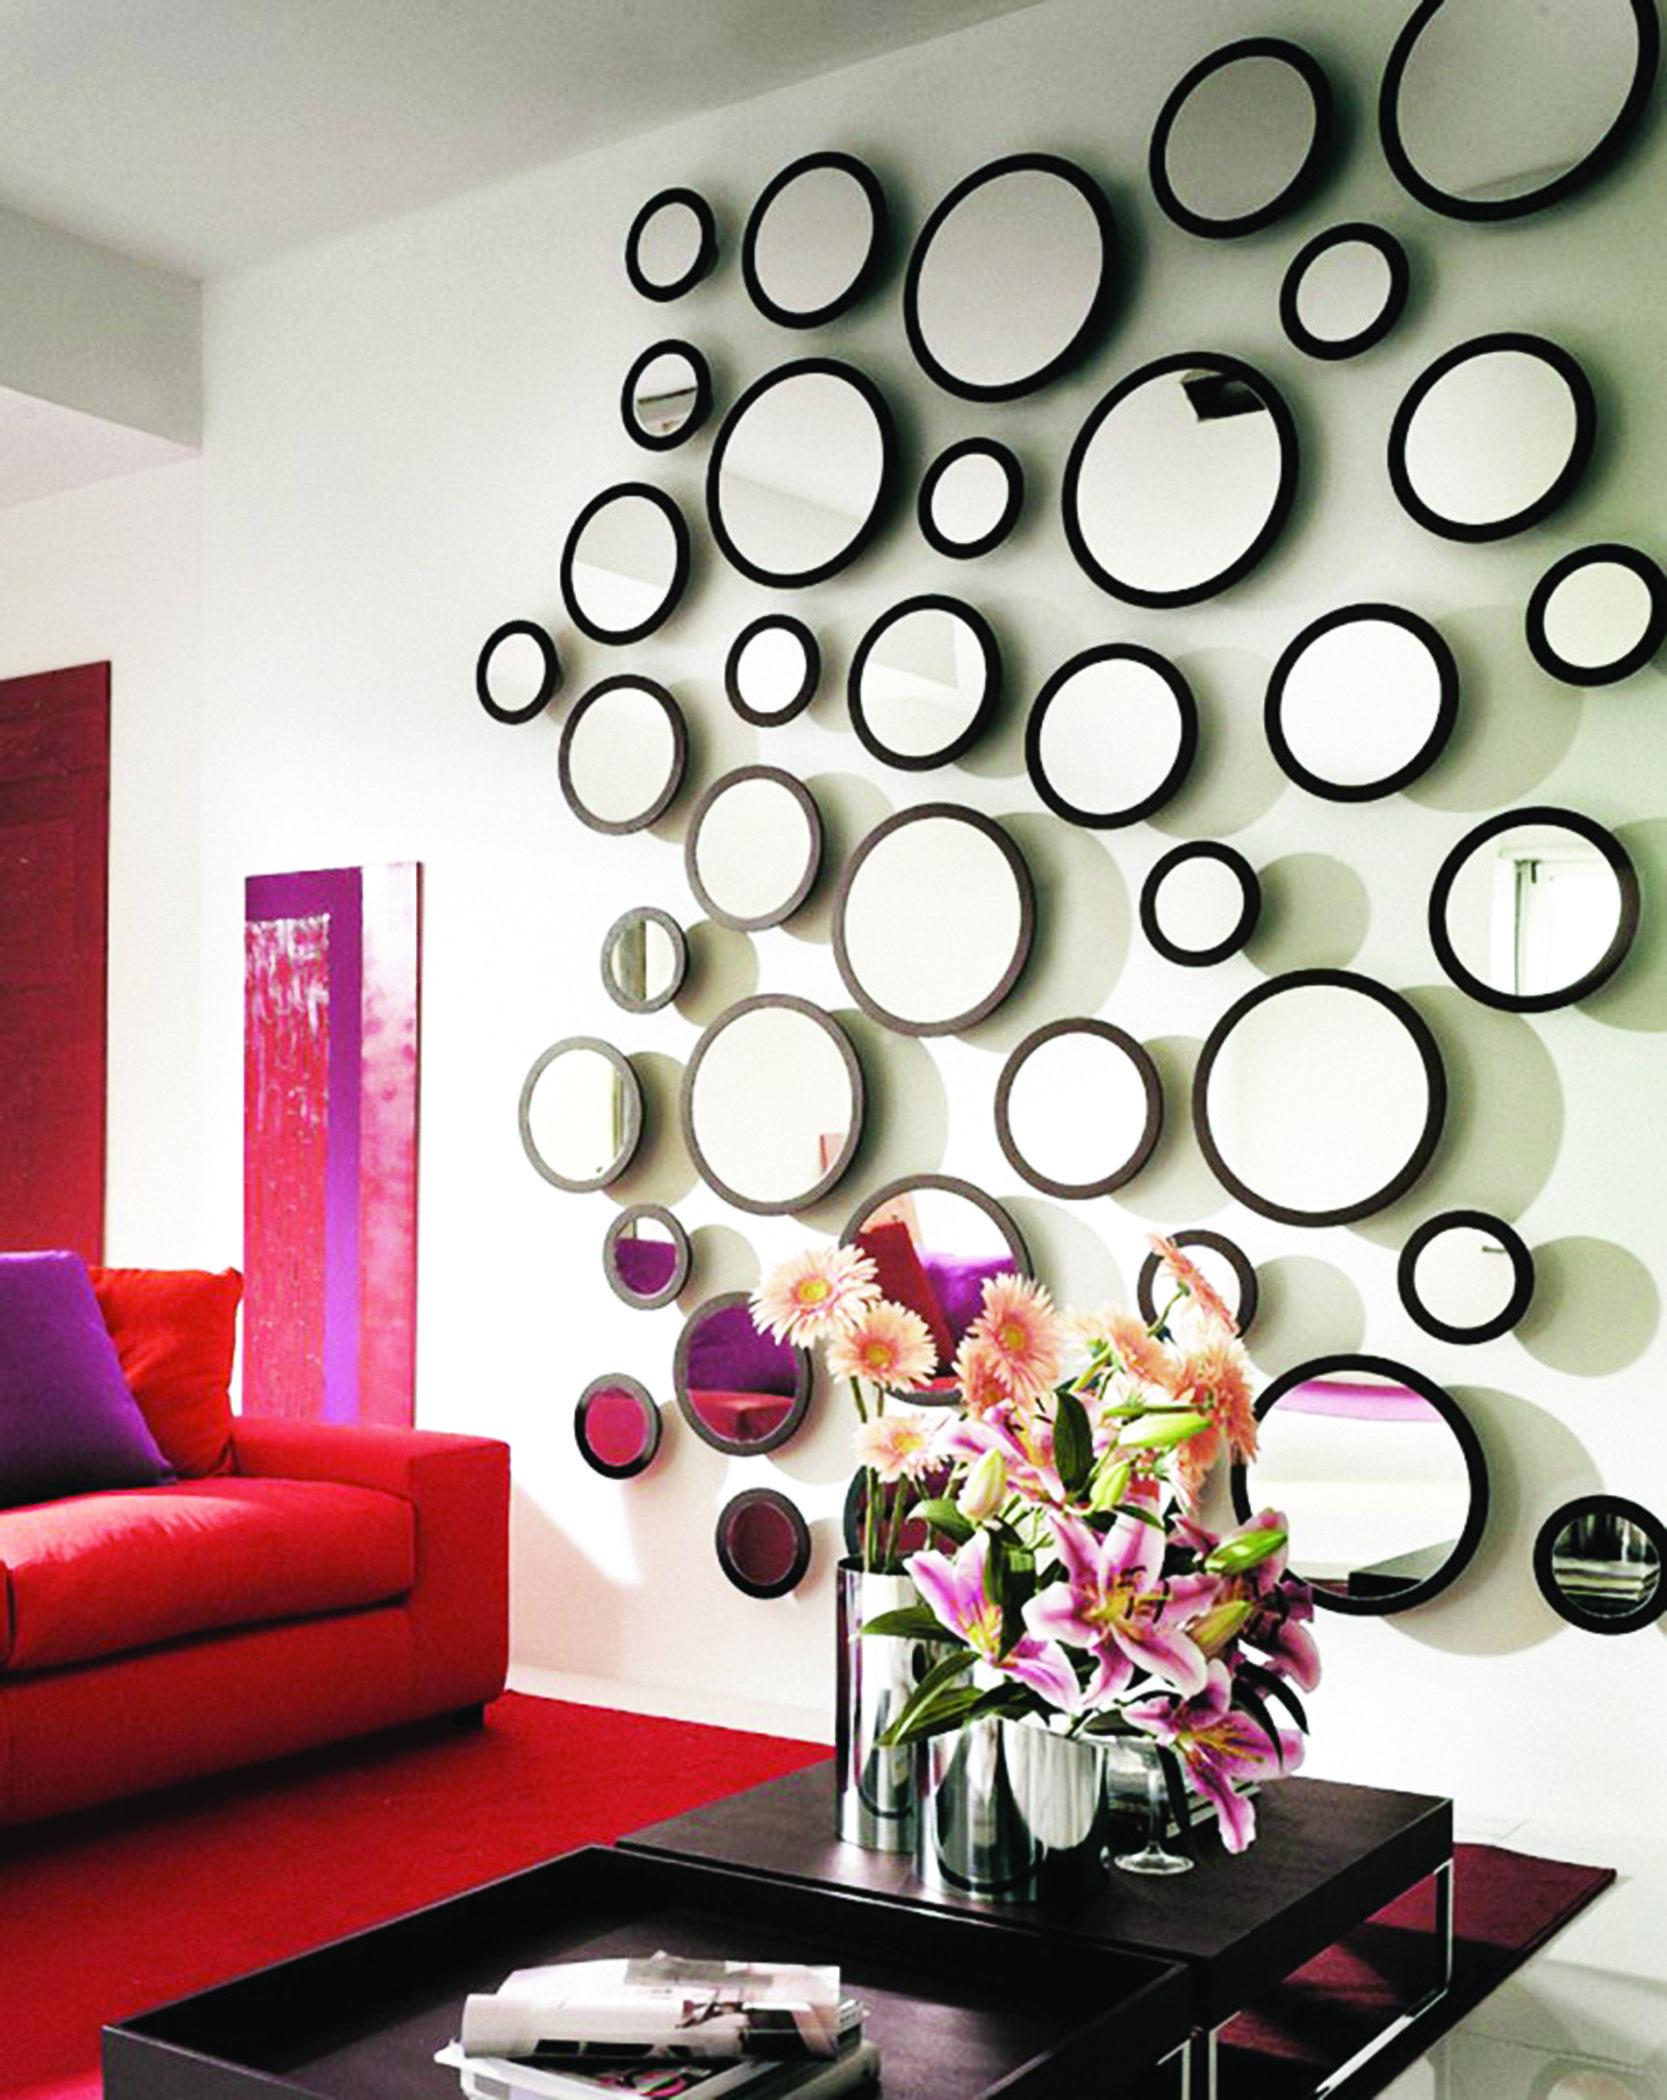 wall decors news ghana - Wall Decors